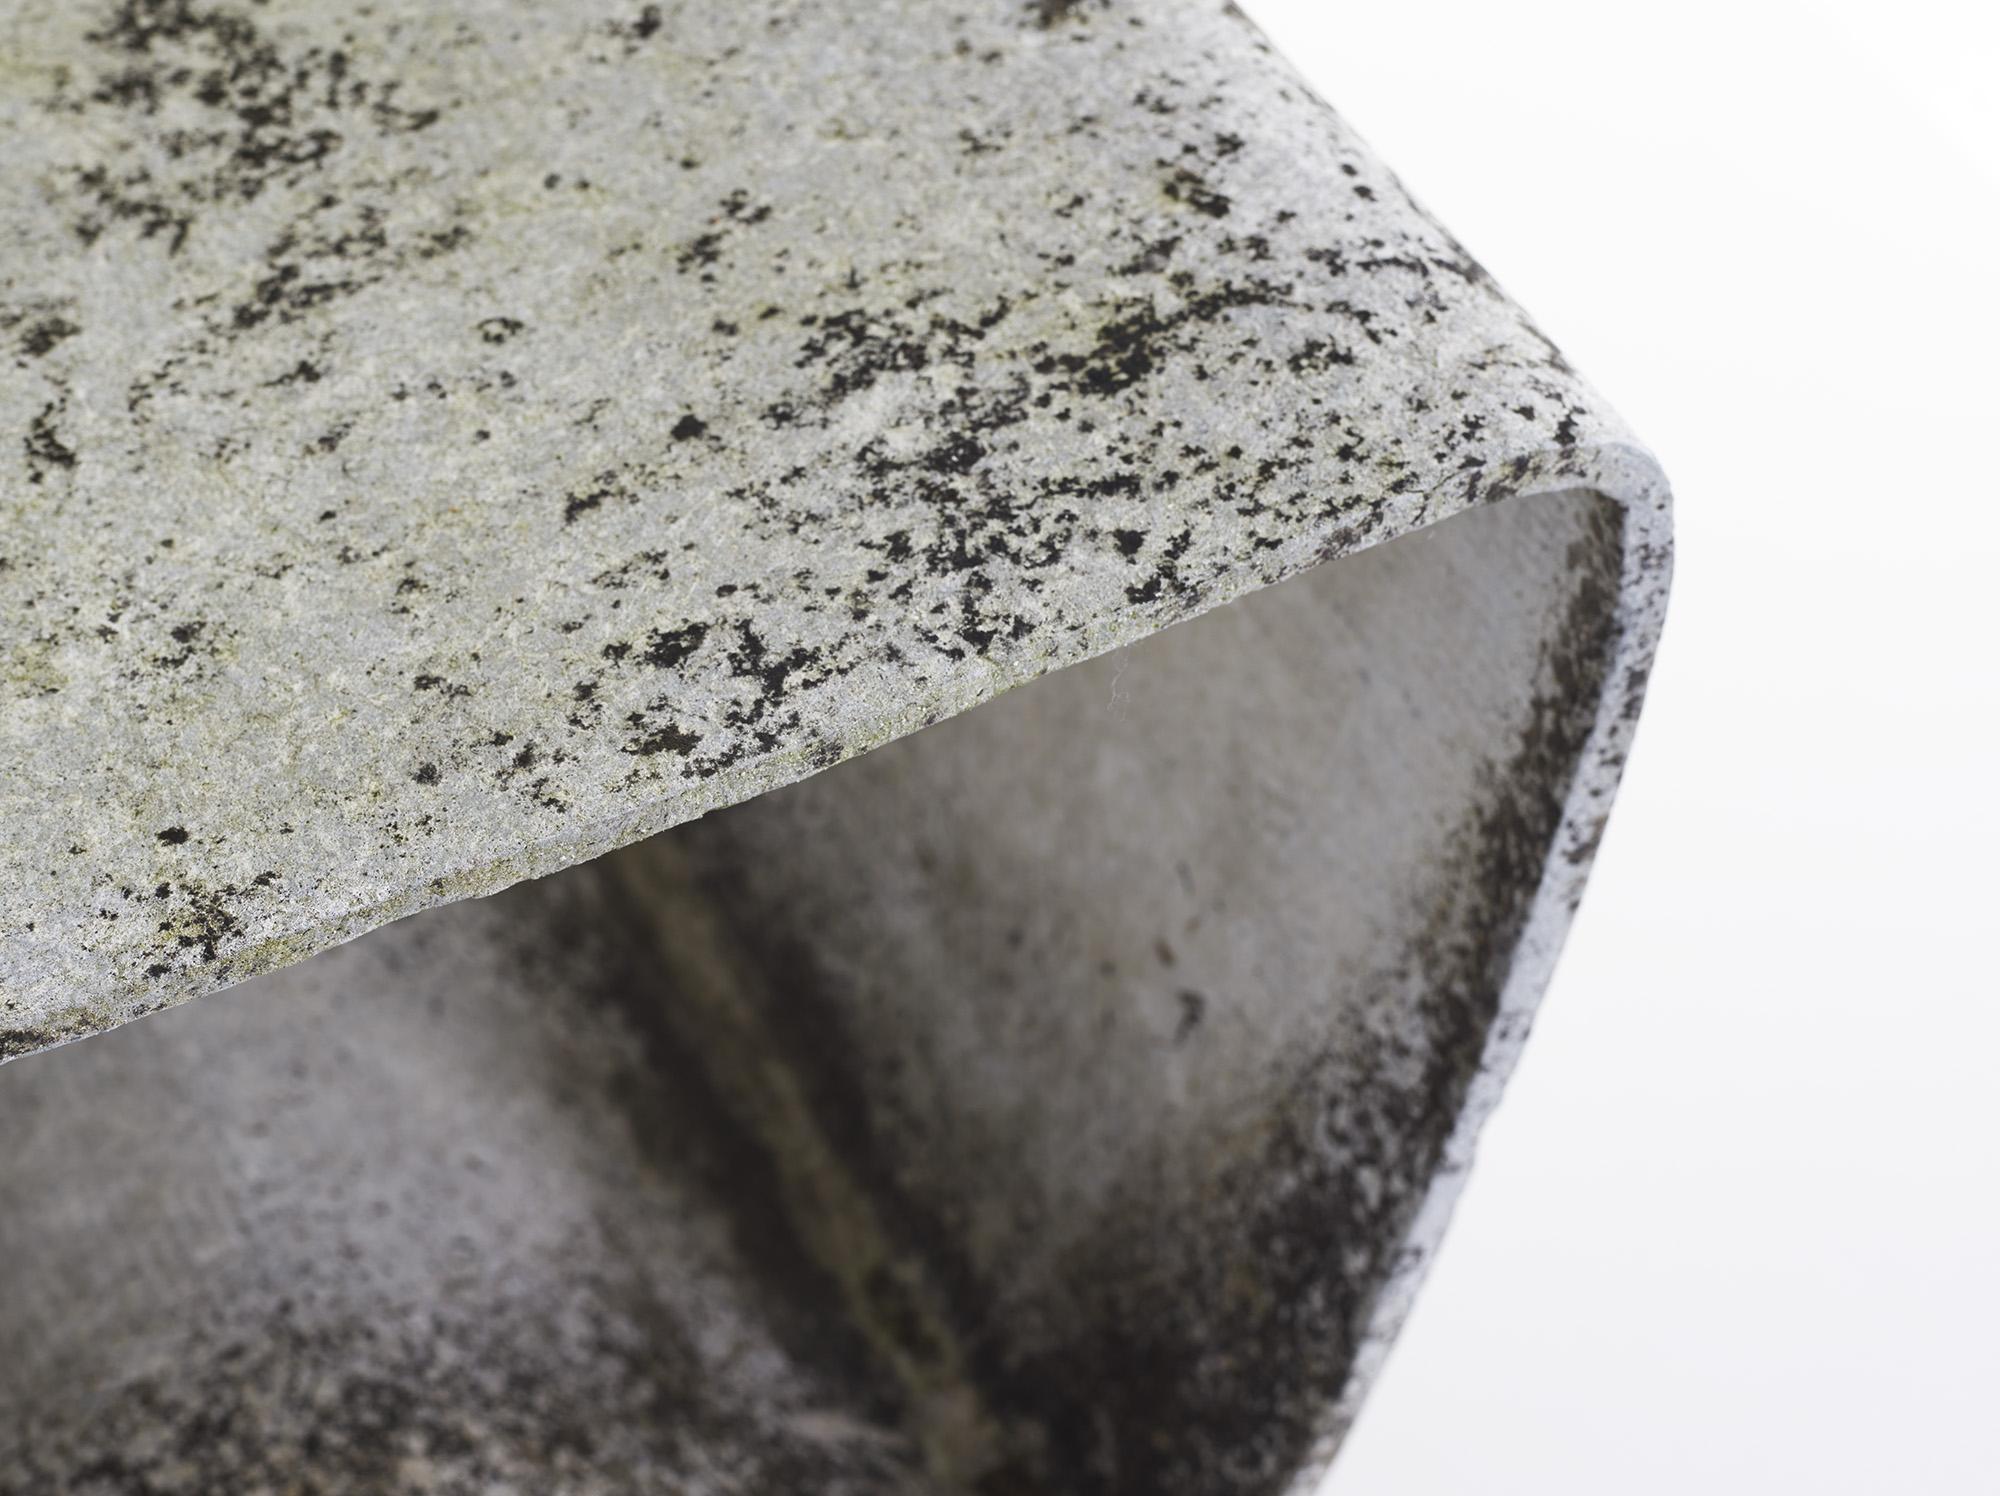 rare-stool-g59-11-by-ludwig-walser-image-07